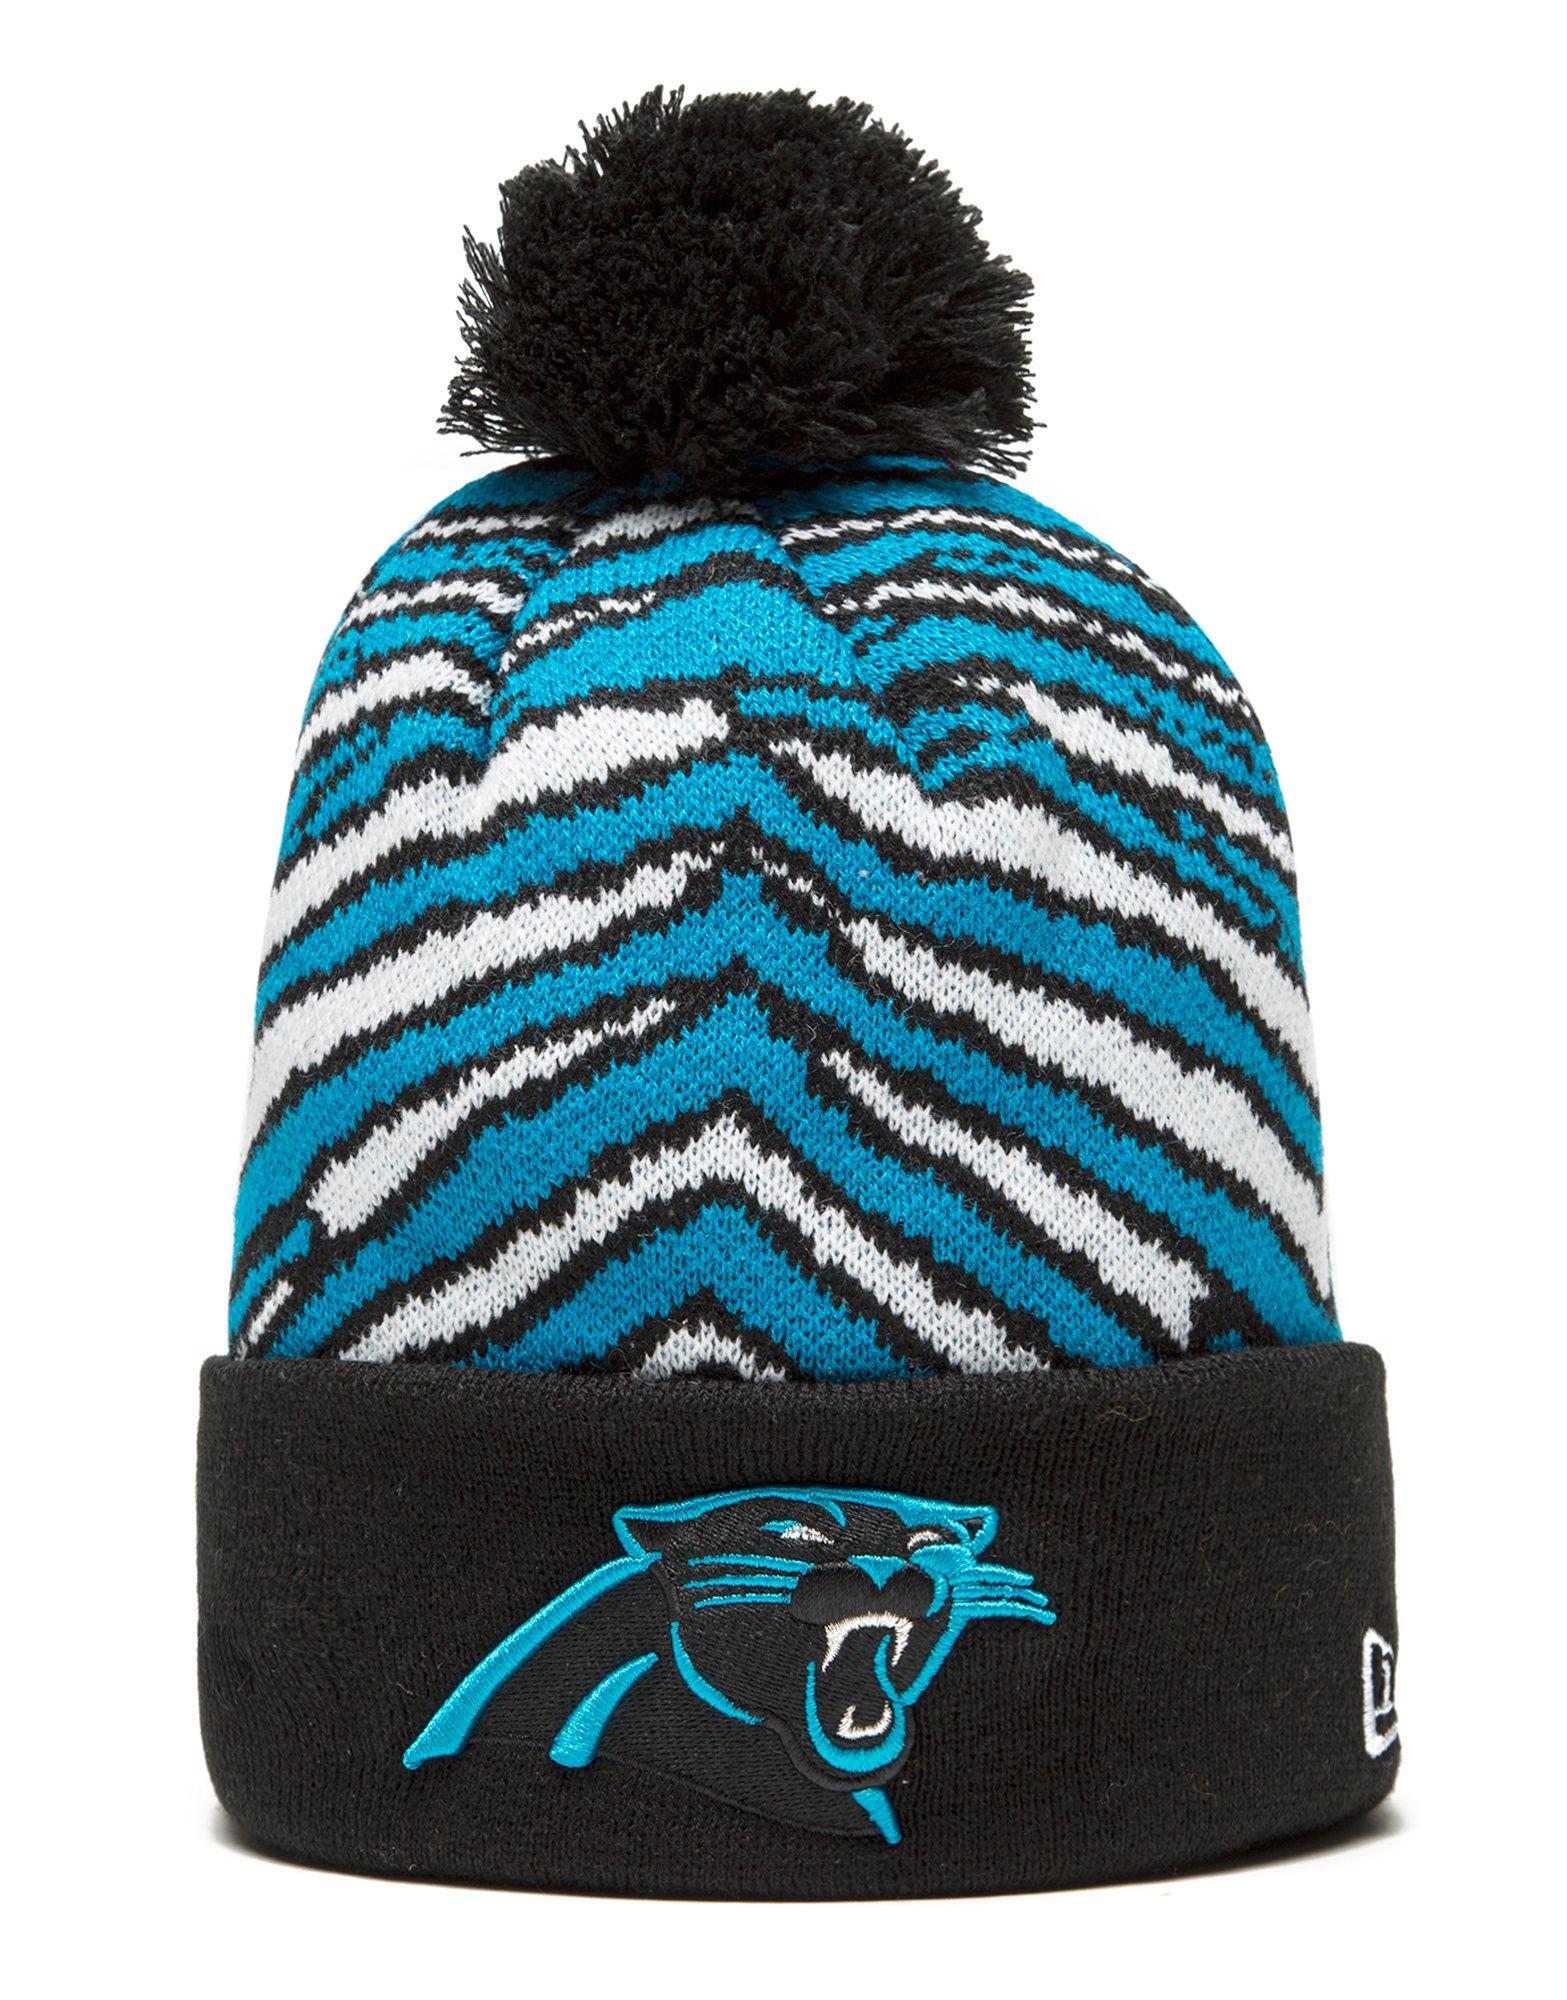 New Era NFL Carolina Panthers Zubaz Bobble Hat